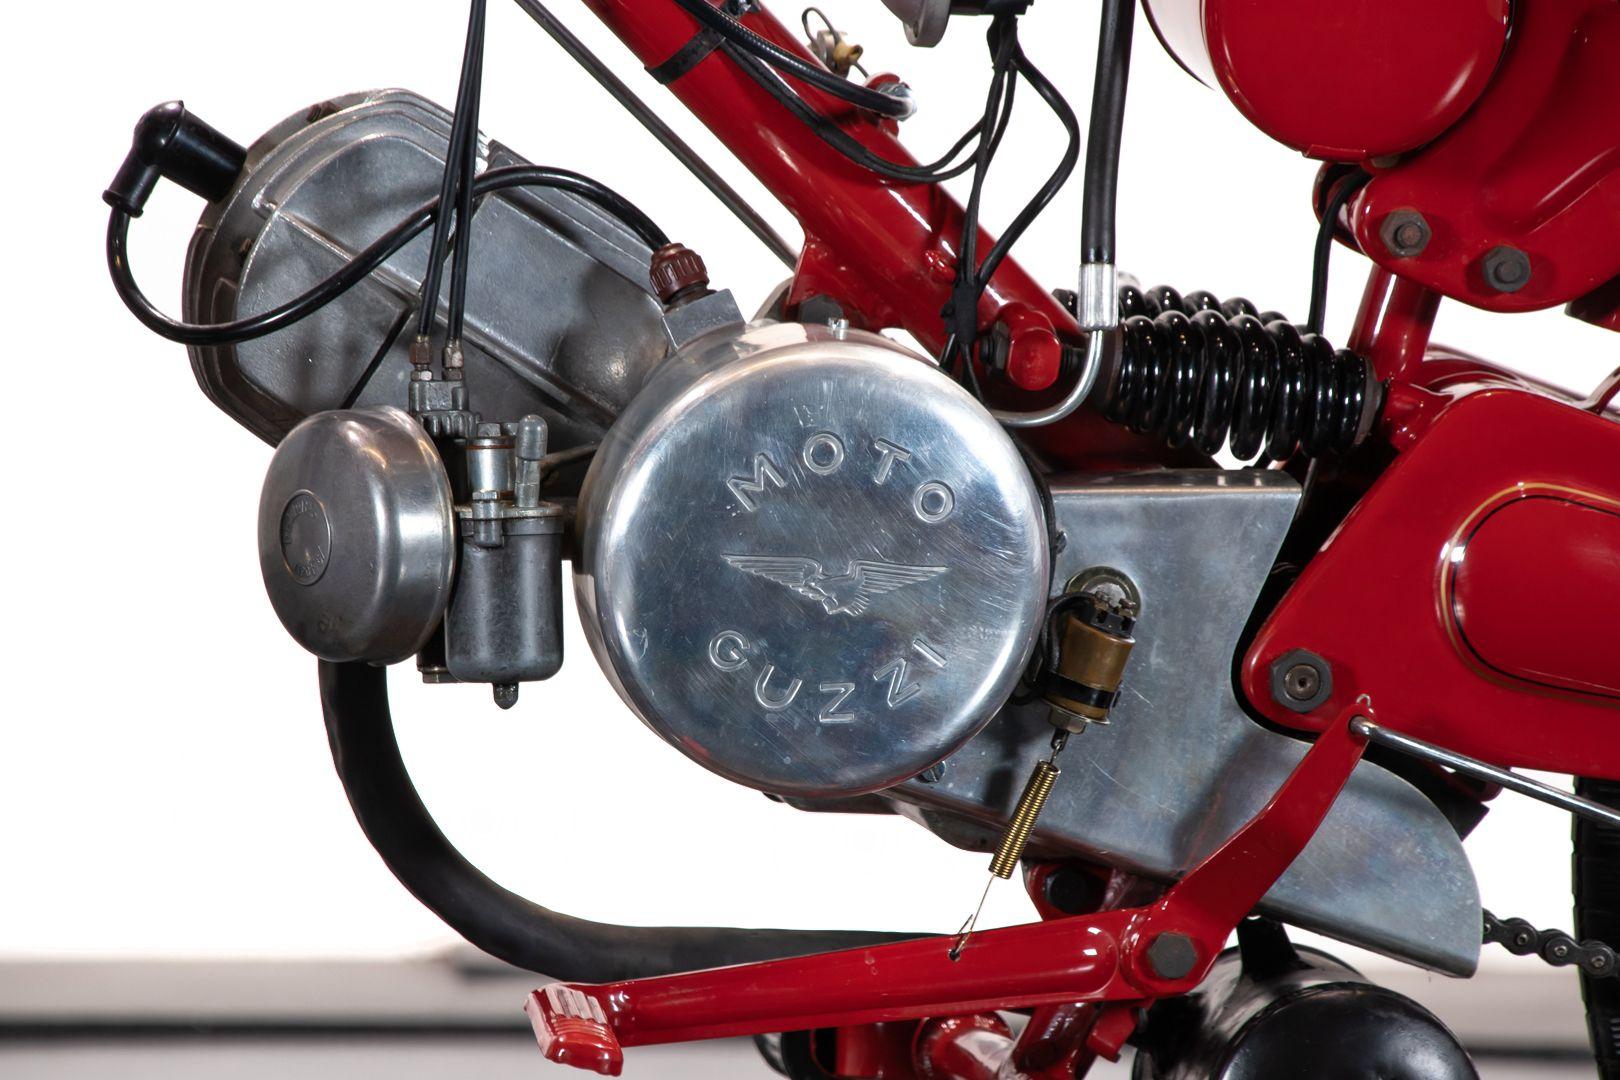 1952 Moto Guzzi 65 59388